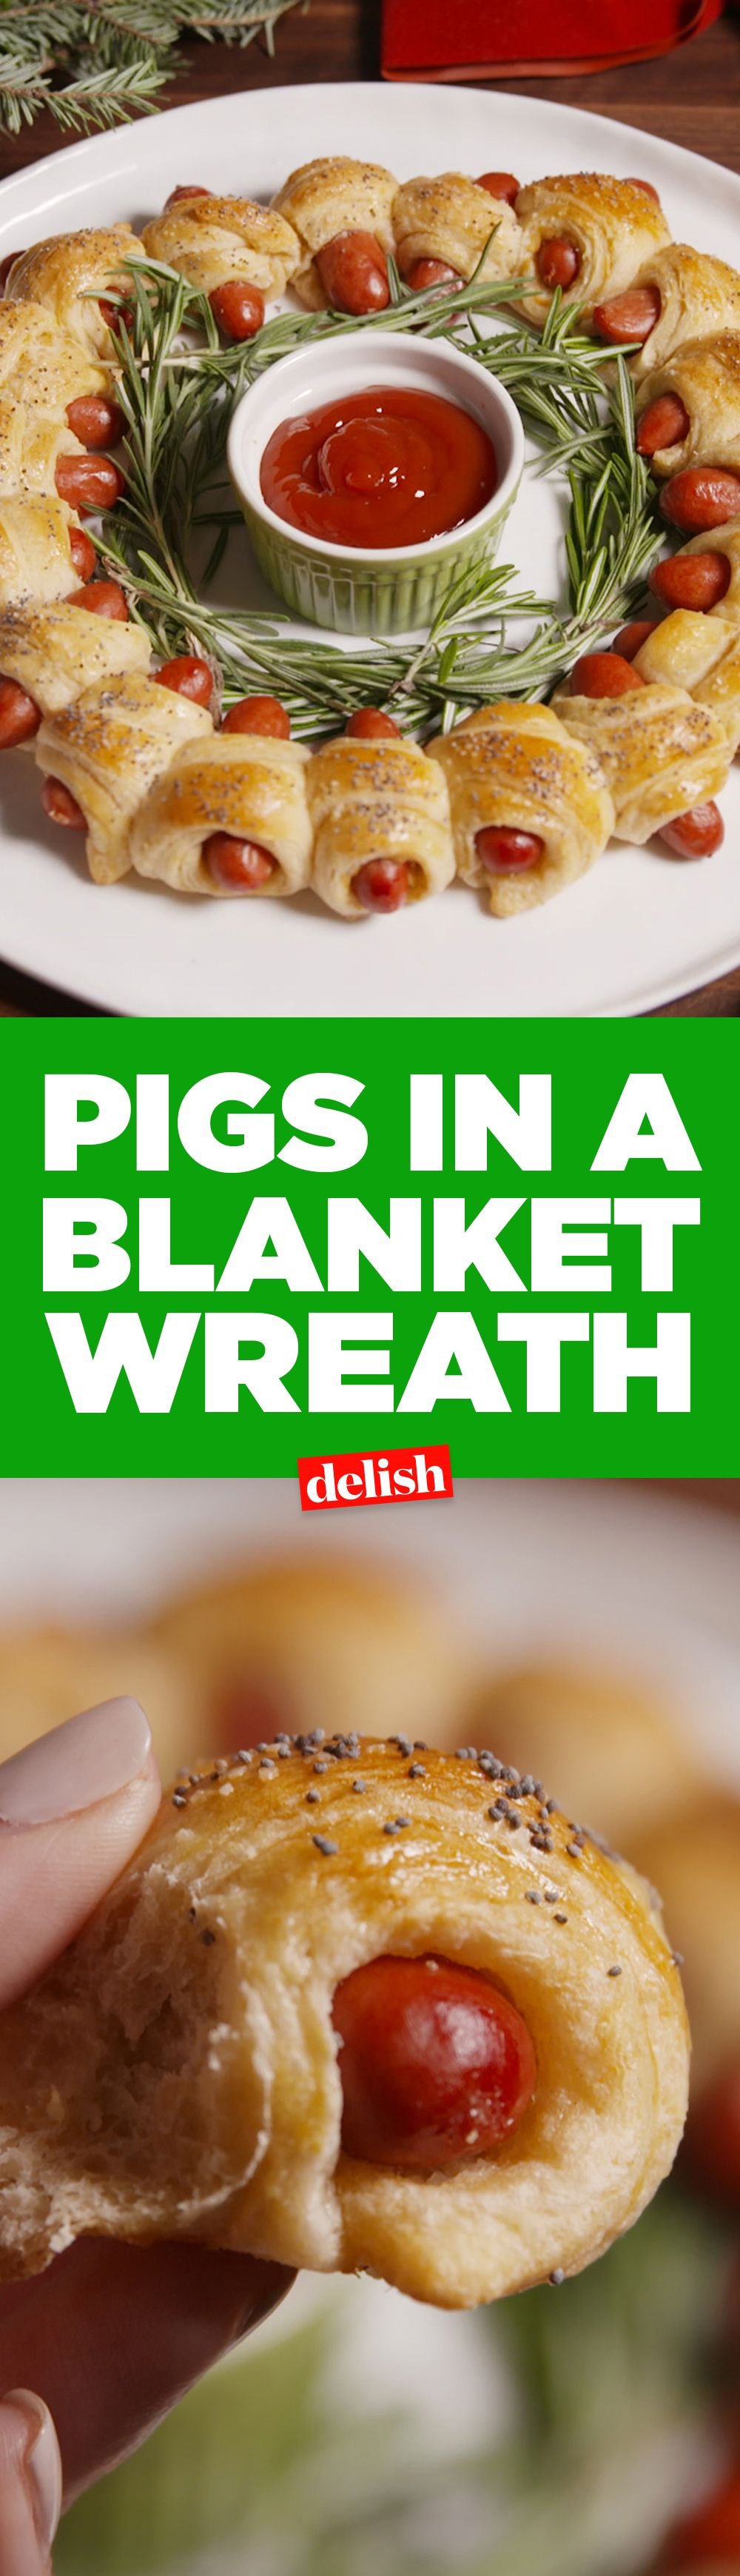 Christmas eve casual buffet ideas - Pigs In A Blanket Wreath Christmas Dinner Food Ideasholiday